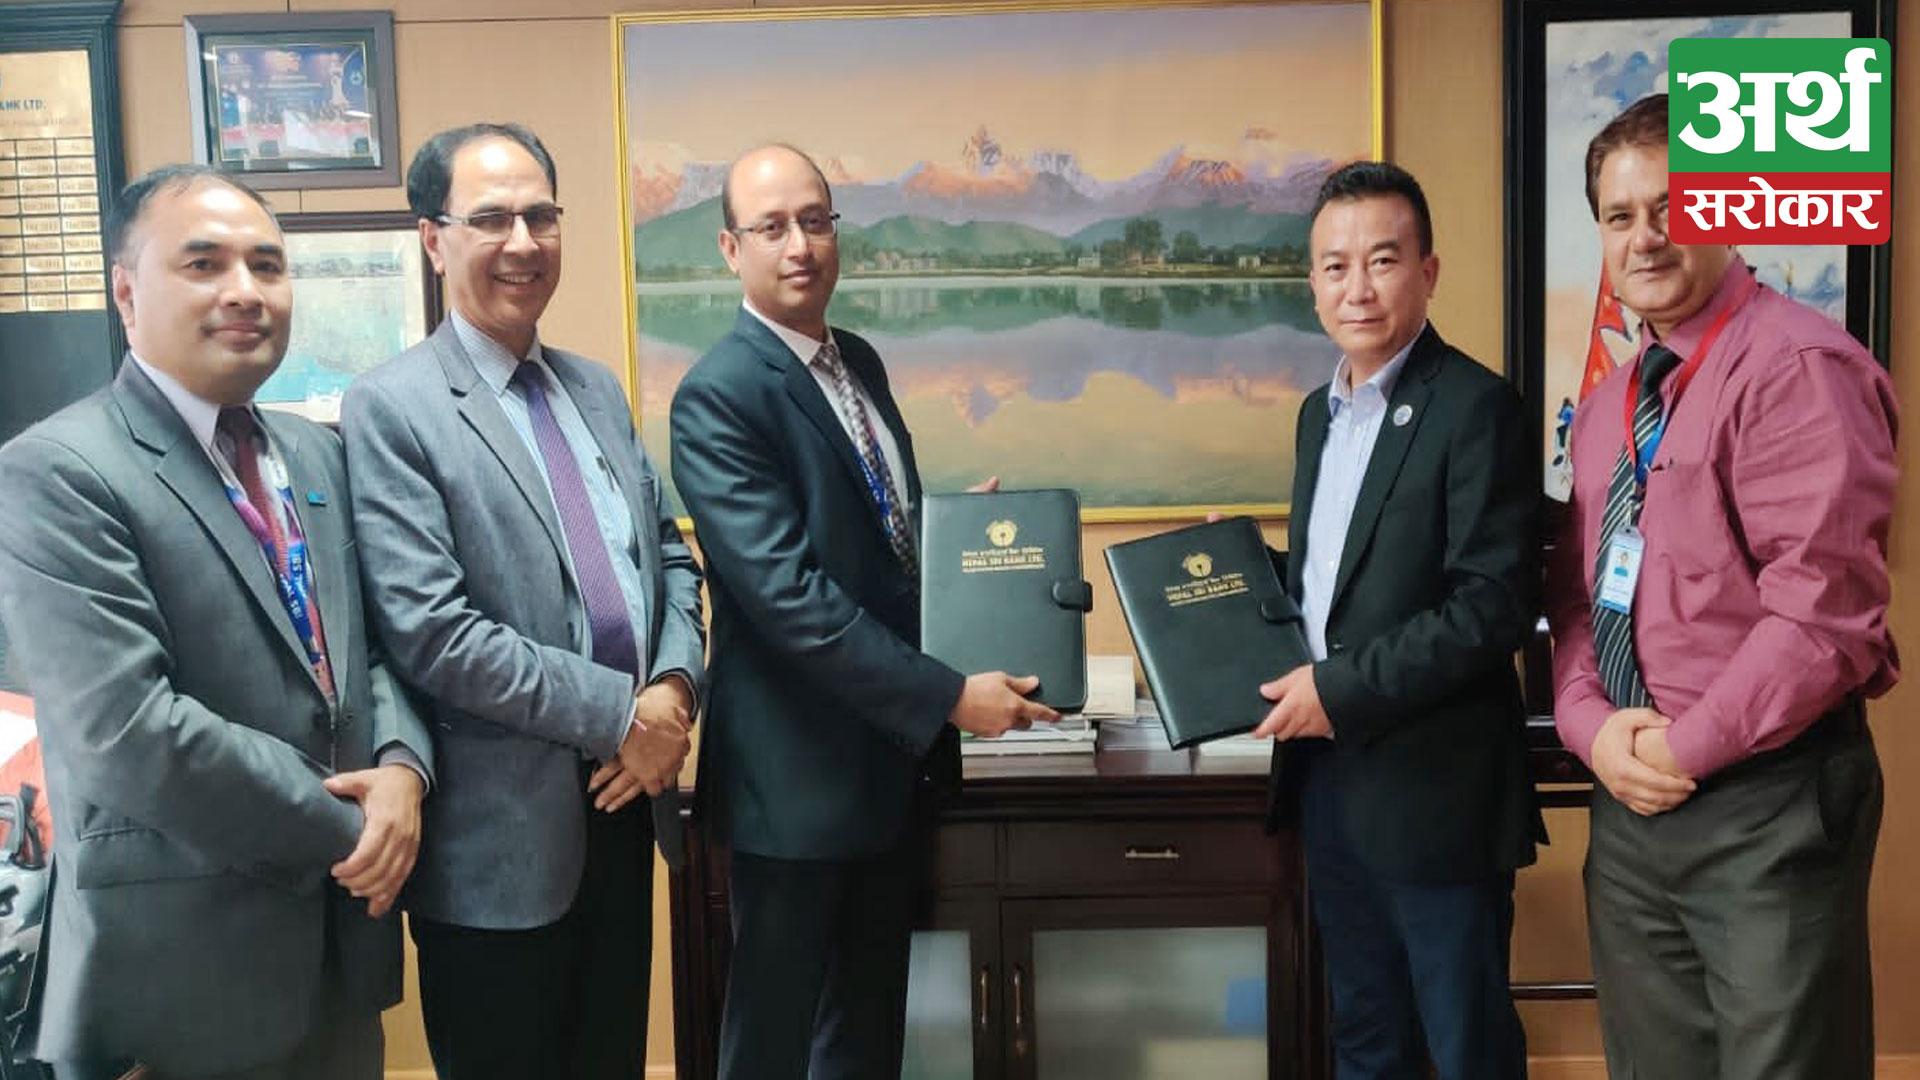 Nepal SBI Bank Ltd. enters into an agreement with Pokhara Finance Ltd.